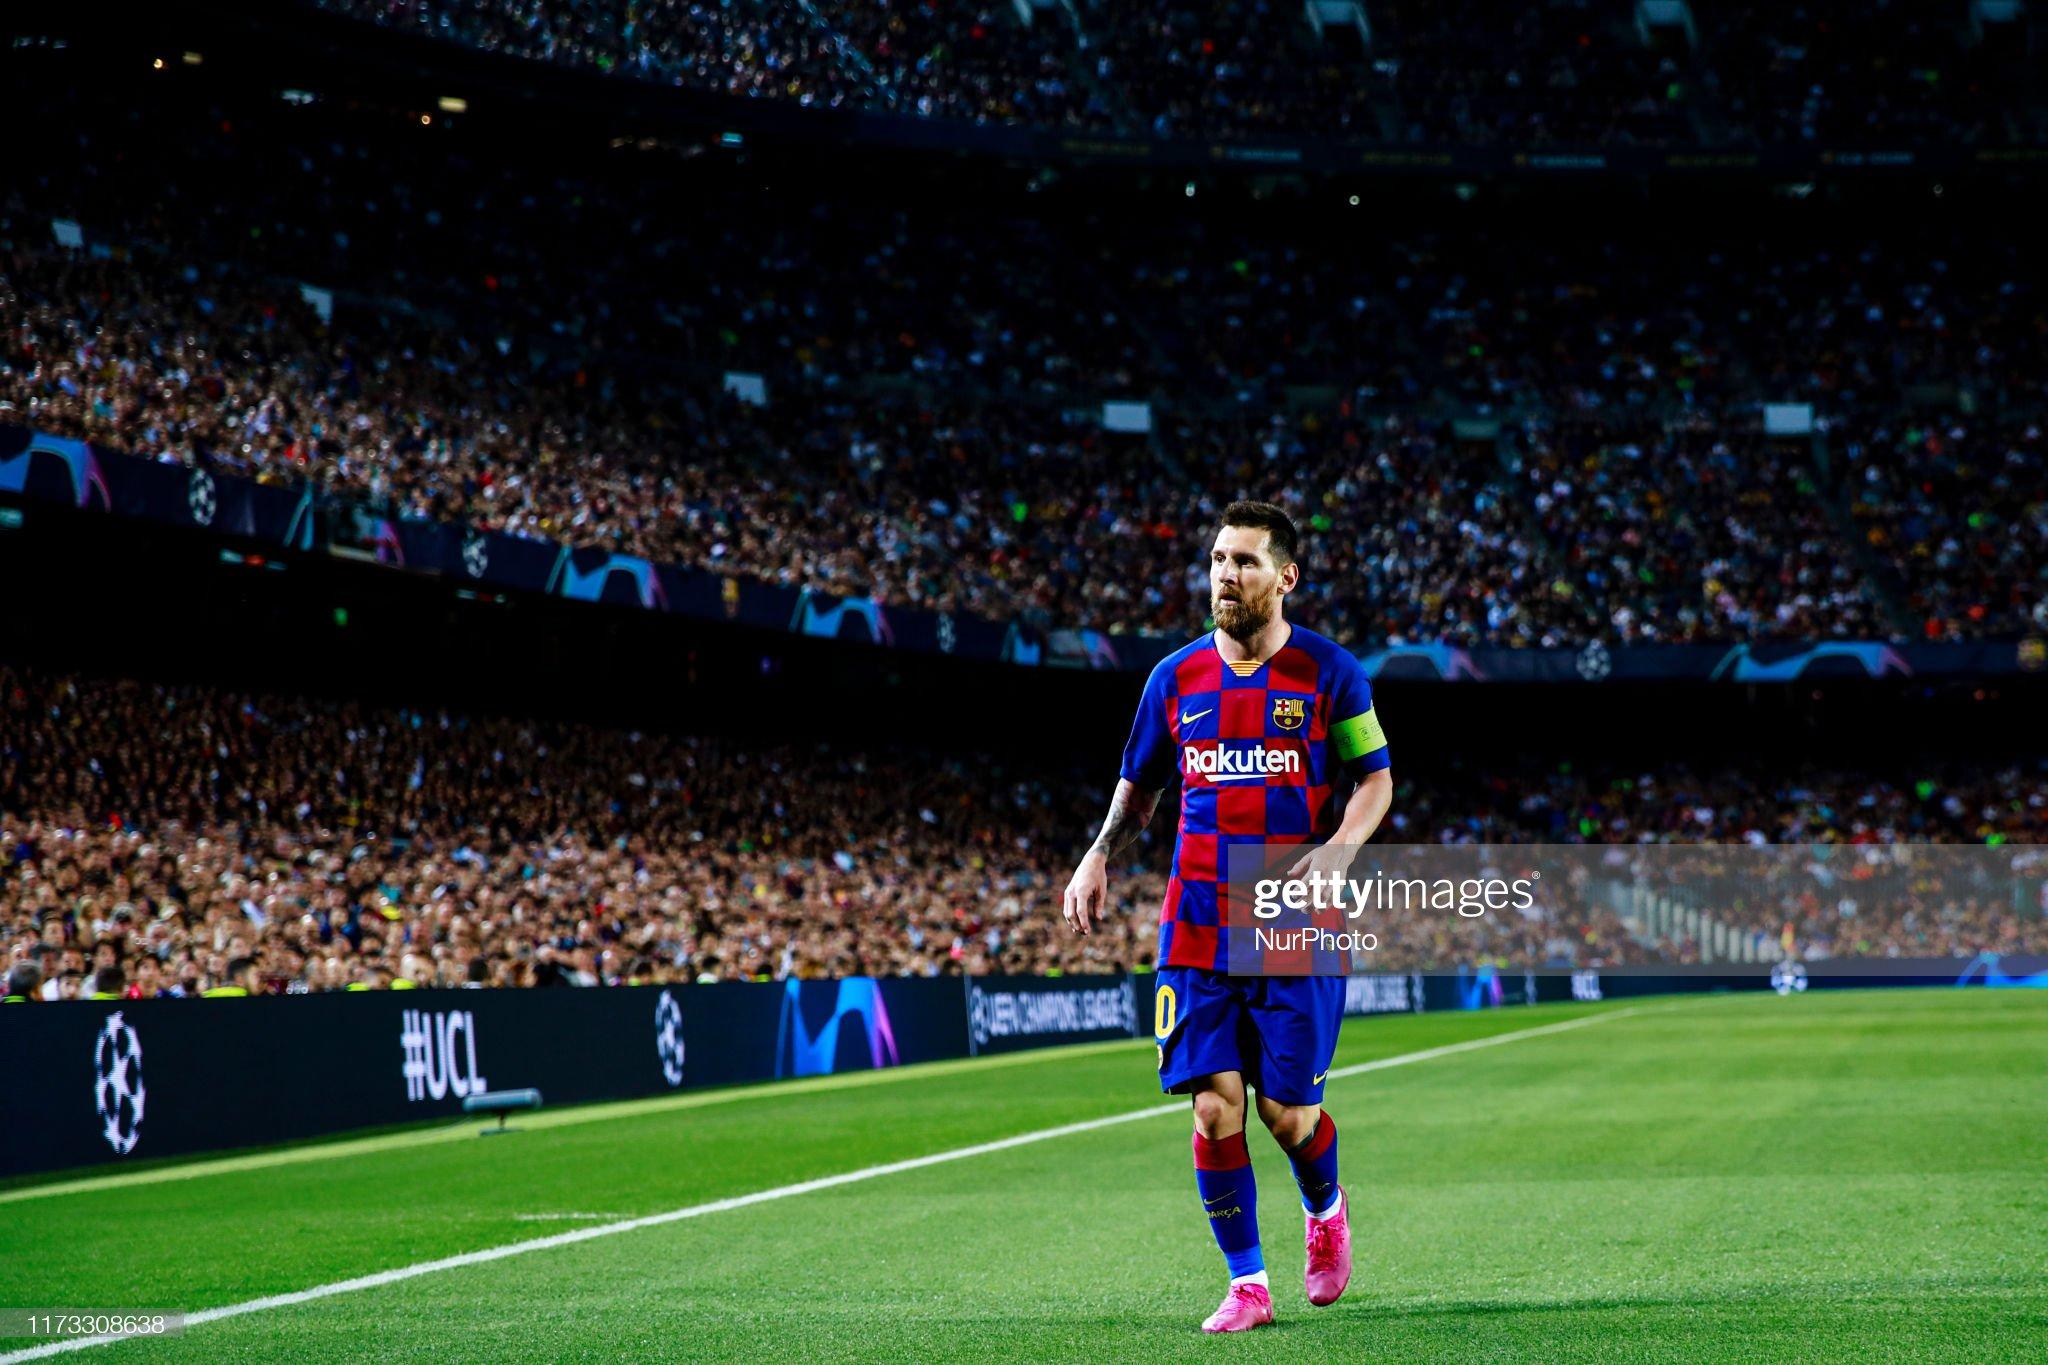 صور مباراة : برشلونة - إنتر 2-1 ( 02-10-2019 )  Lionel-messi-from-argentina-of-fc-barcelona-during-the-uefa-champions-picture-id1173308638?s=2048x2048